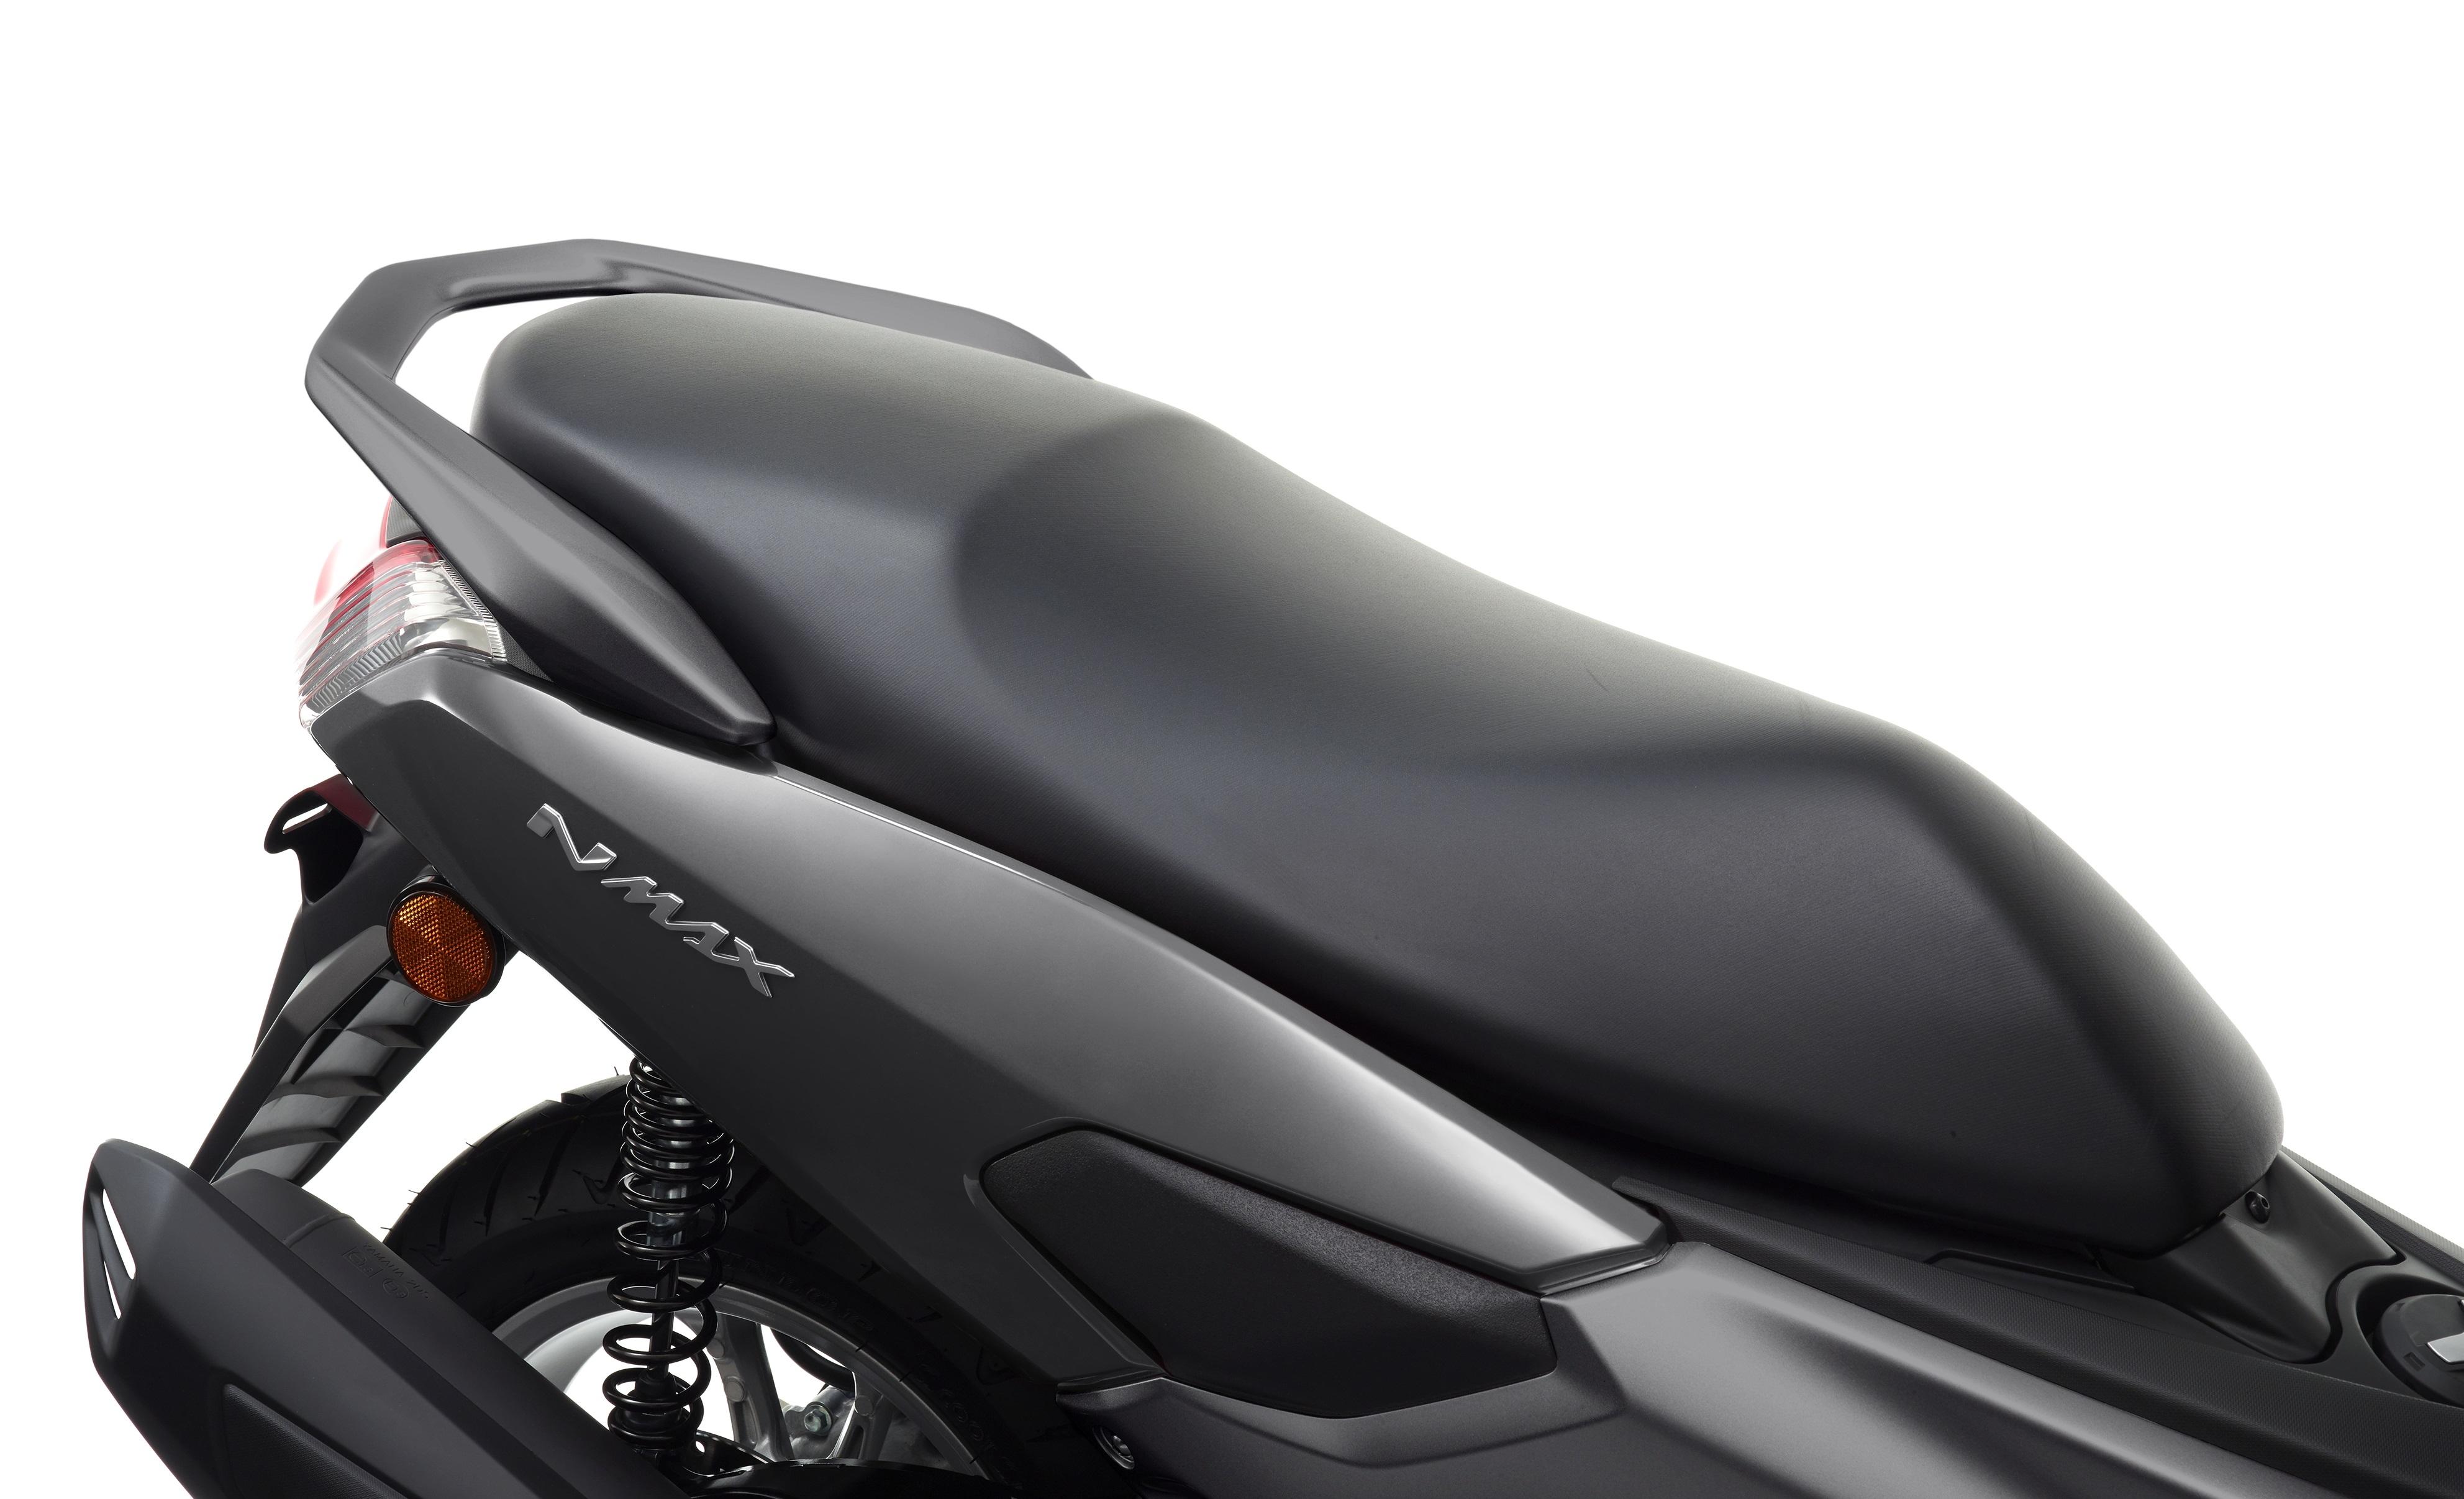 For Sale: Yamaha NMAX • The Bike Market